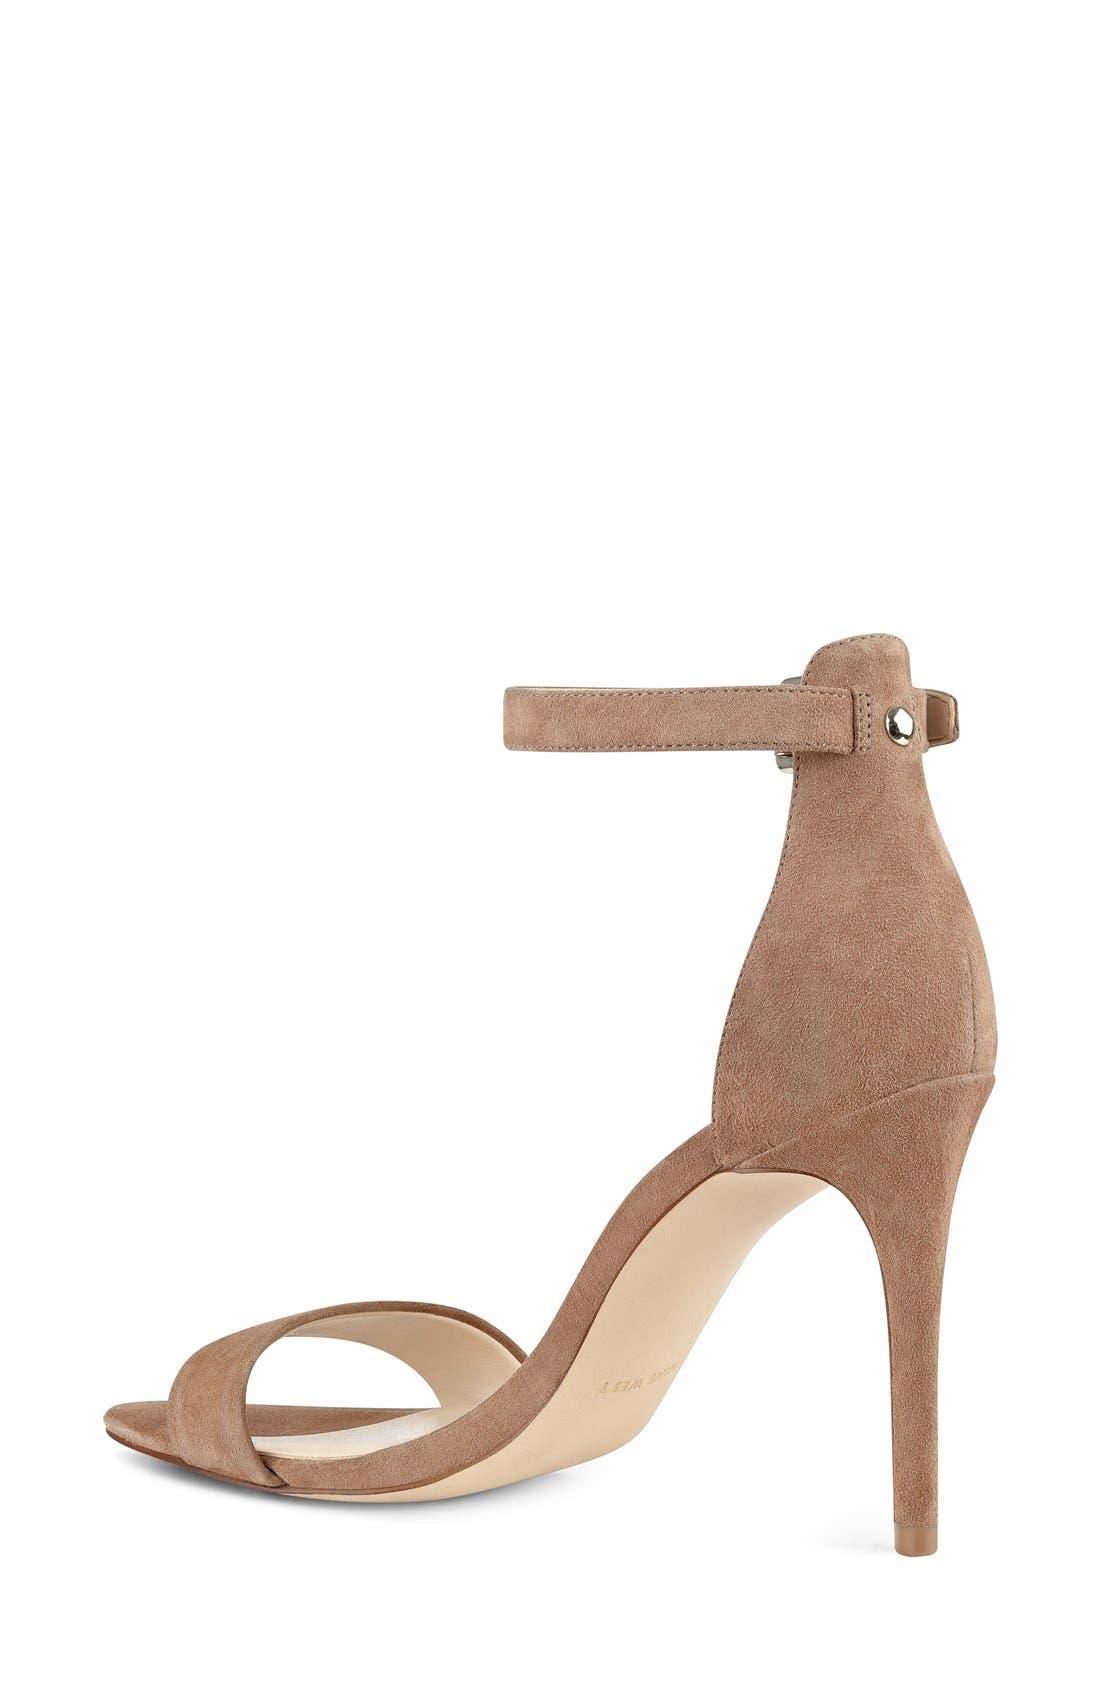 'Mana' Ankle Strap Sandal,                             Alternate thumbnail 9, color,